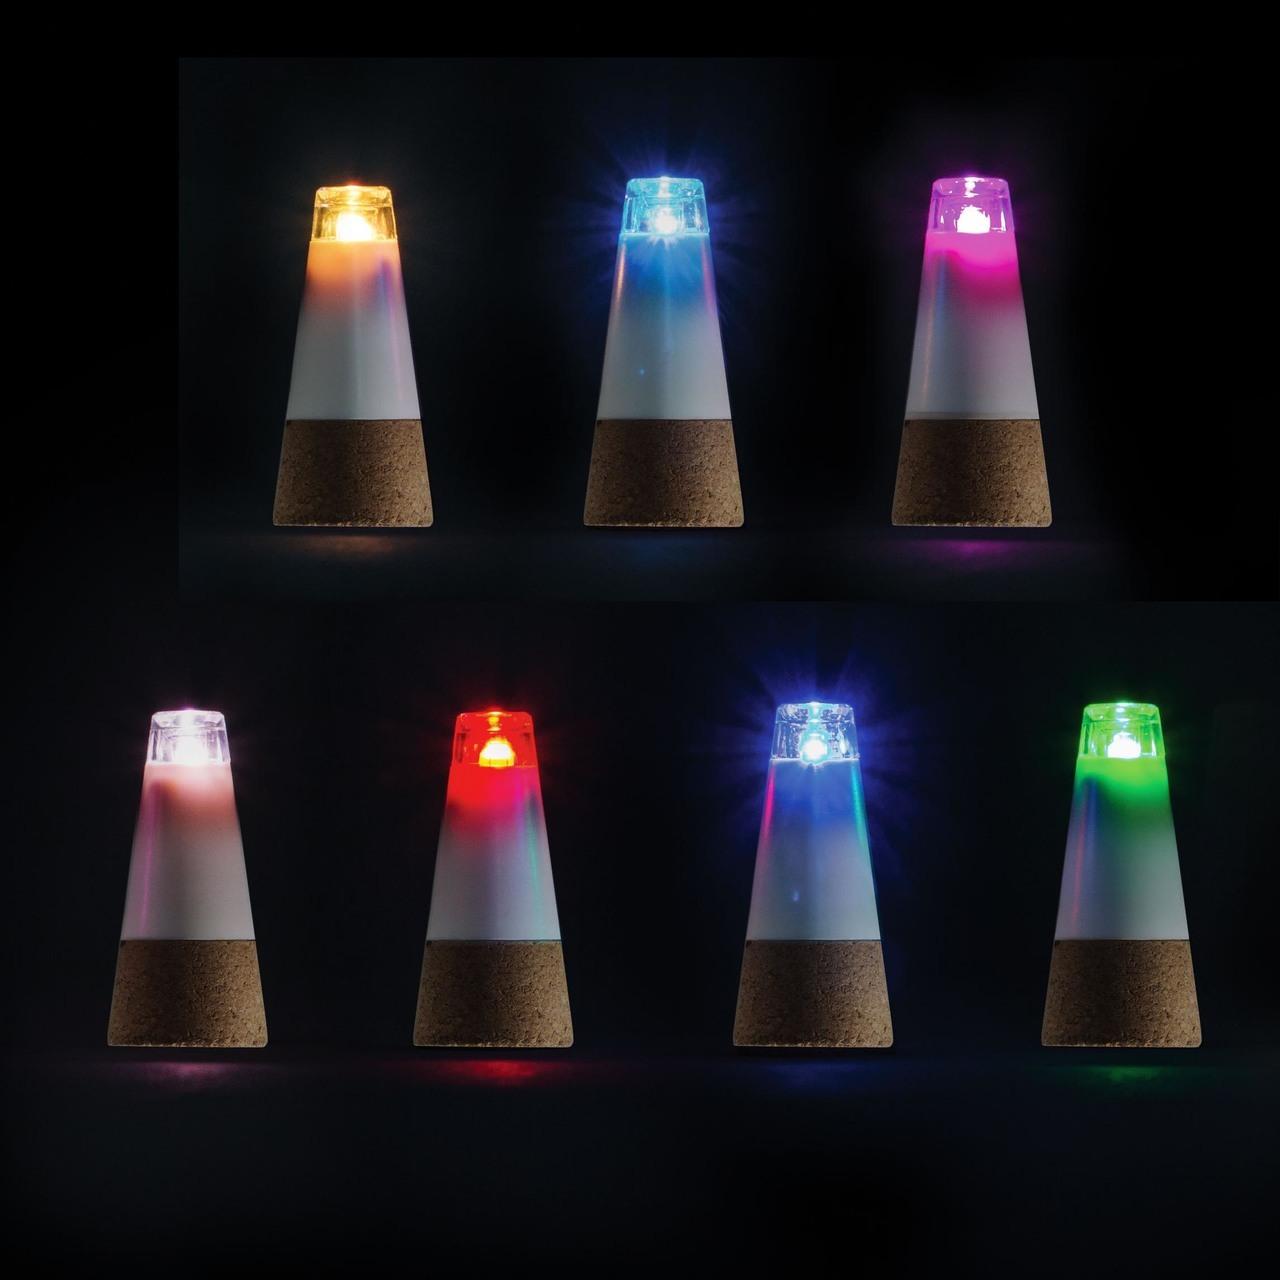 59467_lights-all2-pablo-test__67820.1479911652.1280.1280.jpg